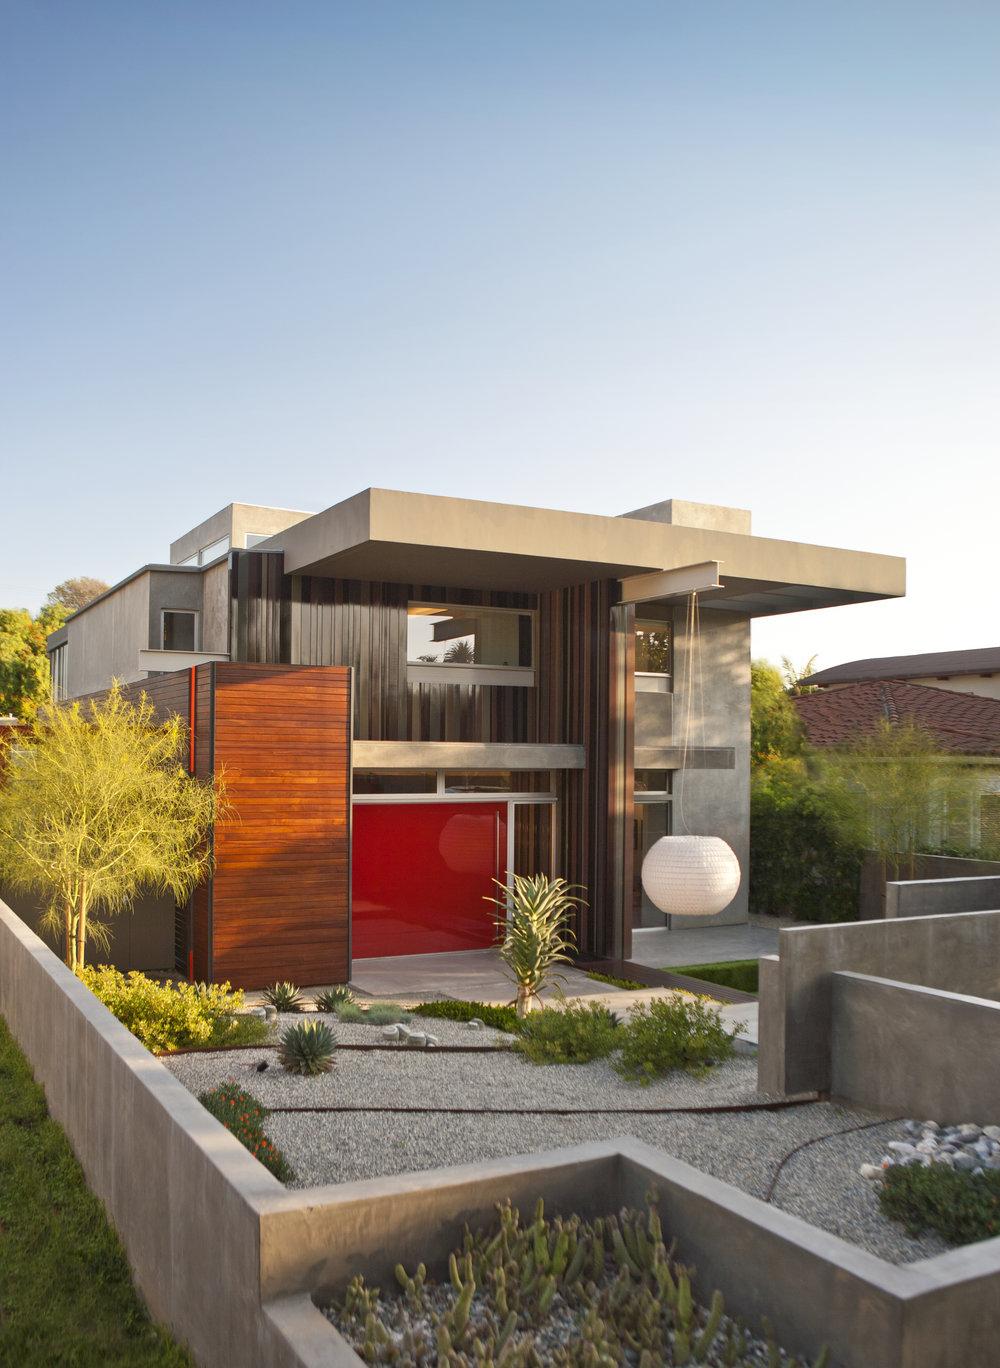 Energy Neutral Home milik Lisa Ling - source: pinterest.com